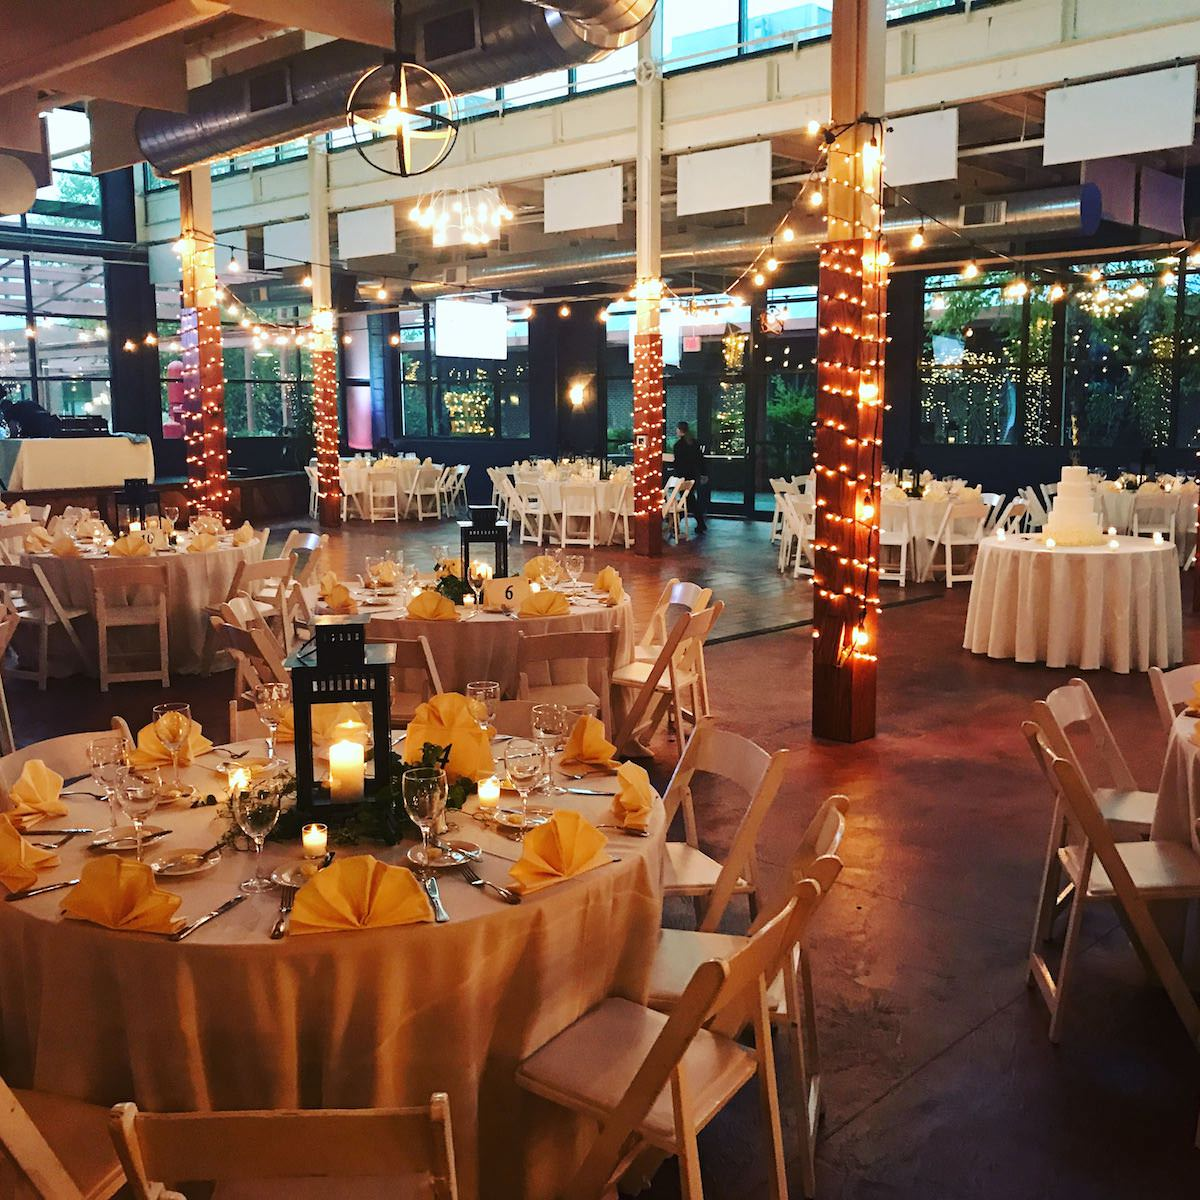 The #1 Fall Wedding Venue In The Area